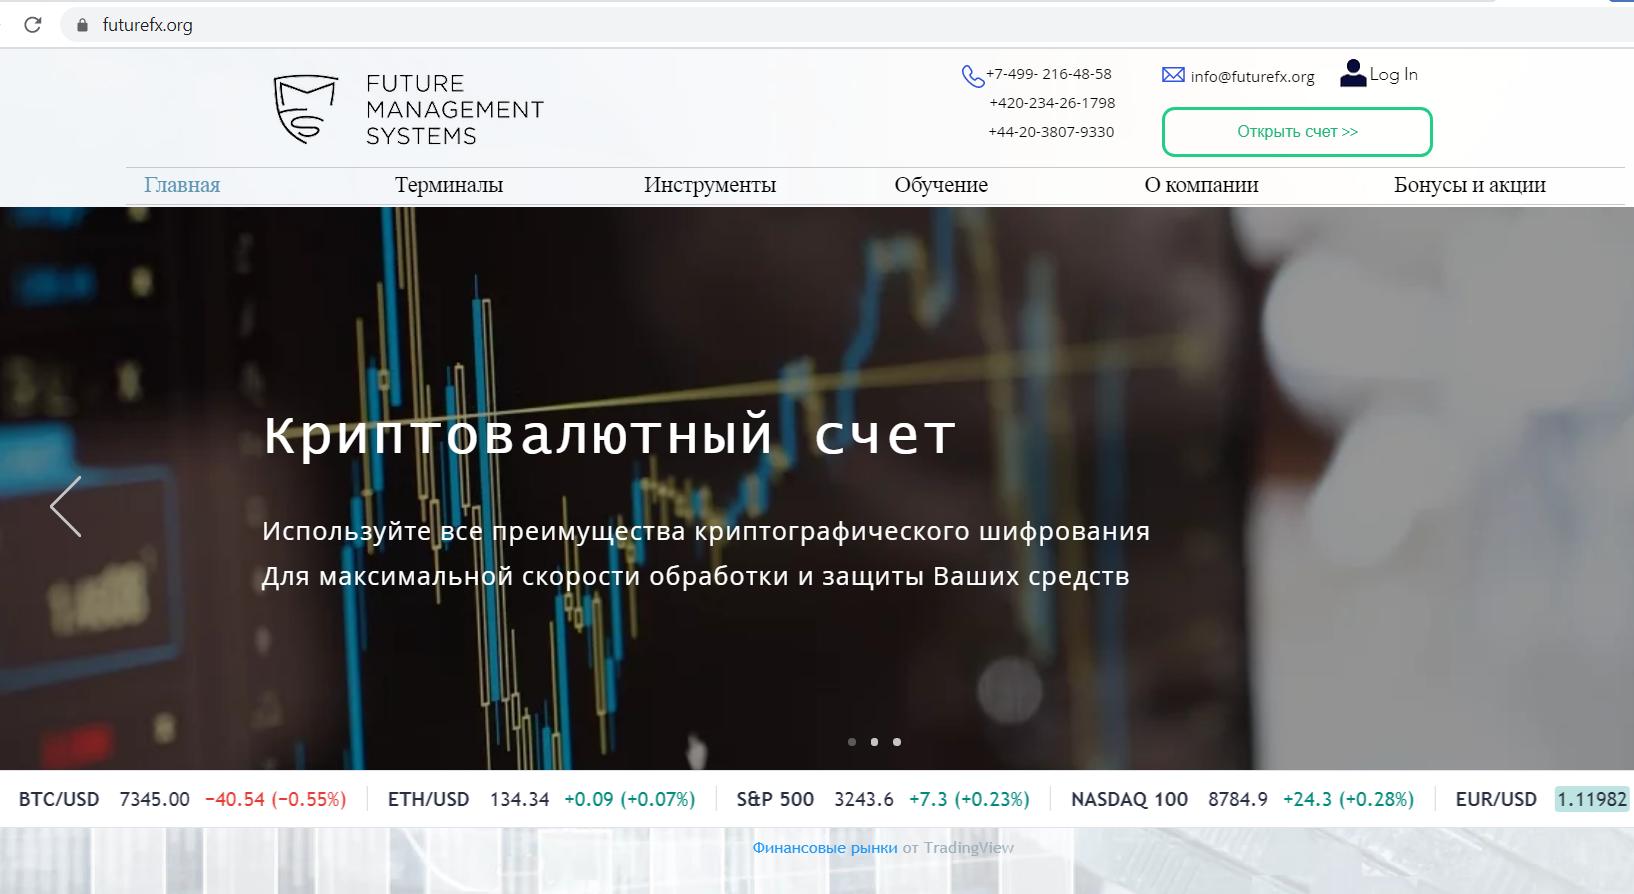 Сайт futurefx.org